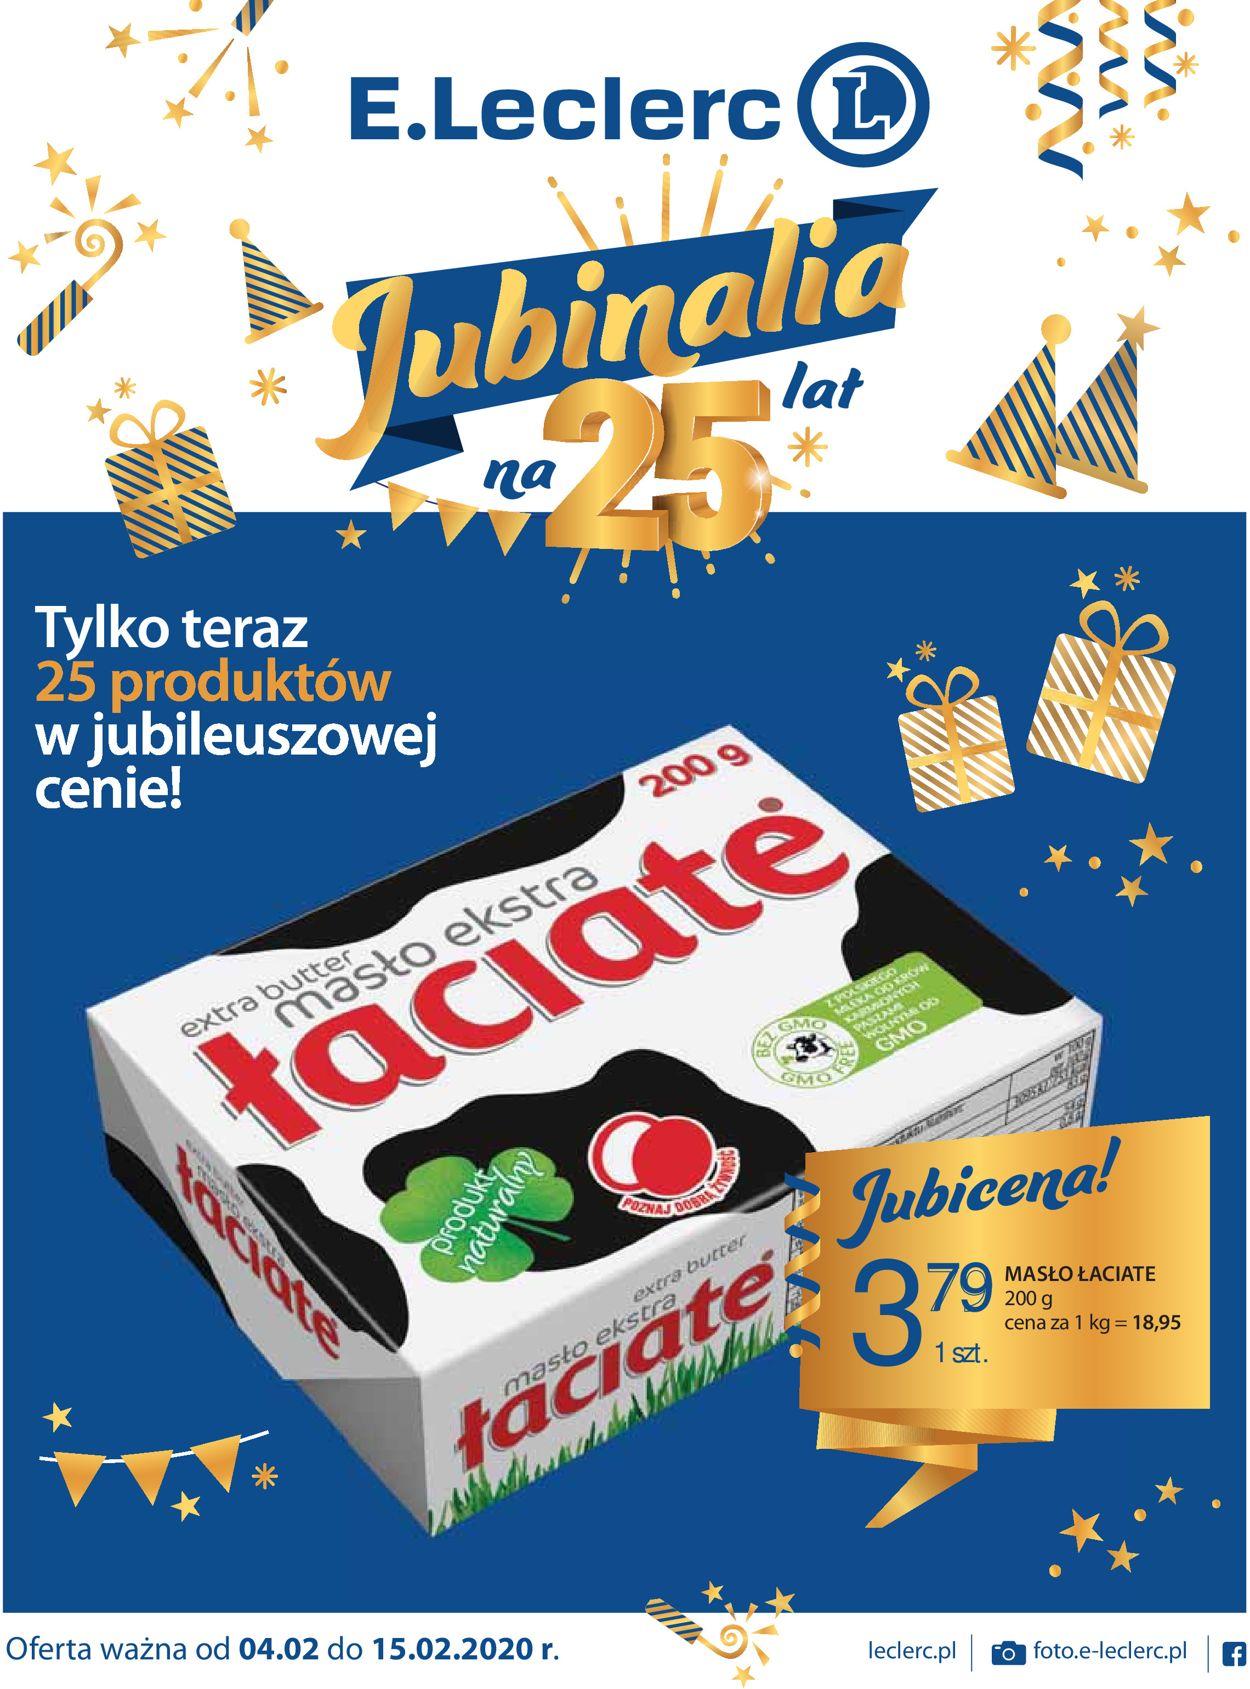 Gazetka promocyjna E.Leclerc - 04.02-15.02.2020